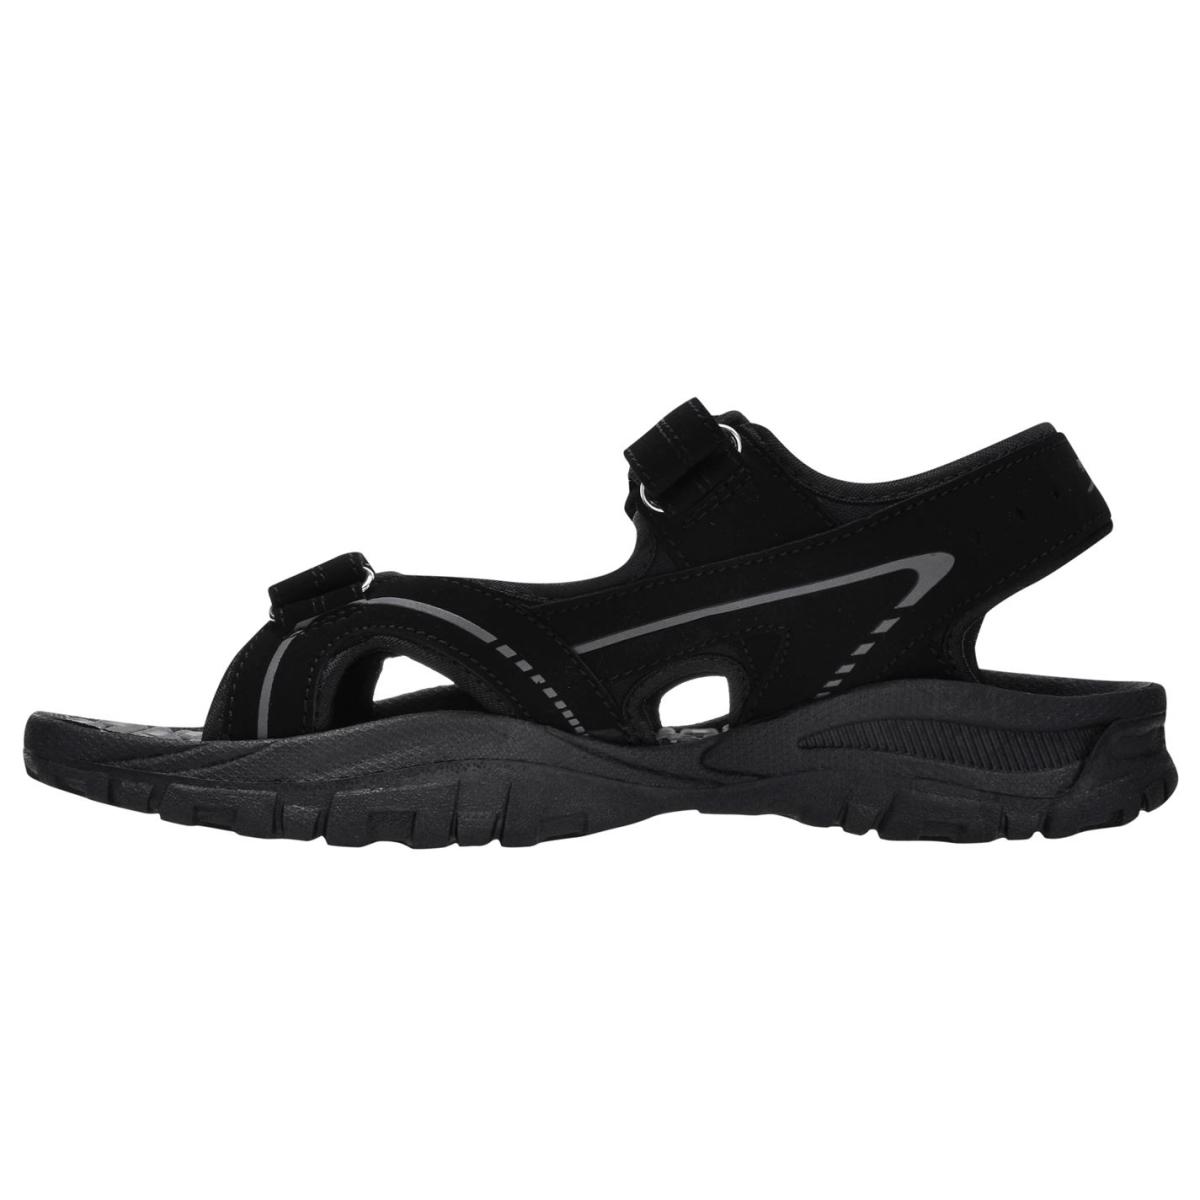 Slazenger Wave señores trekking sandalias sandalias outdoor casual 2132